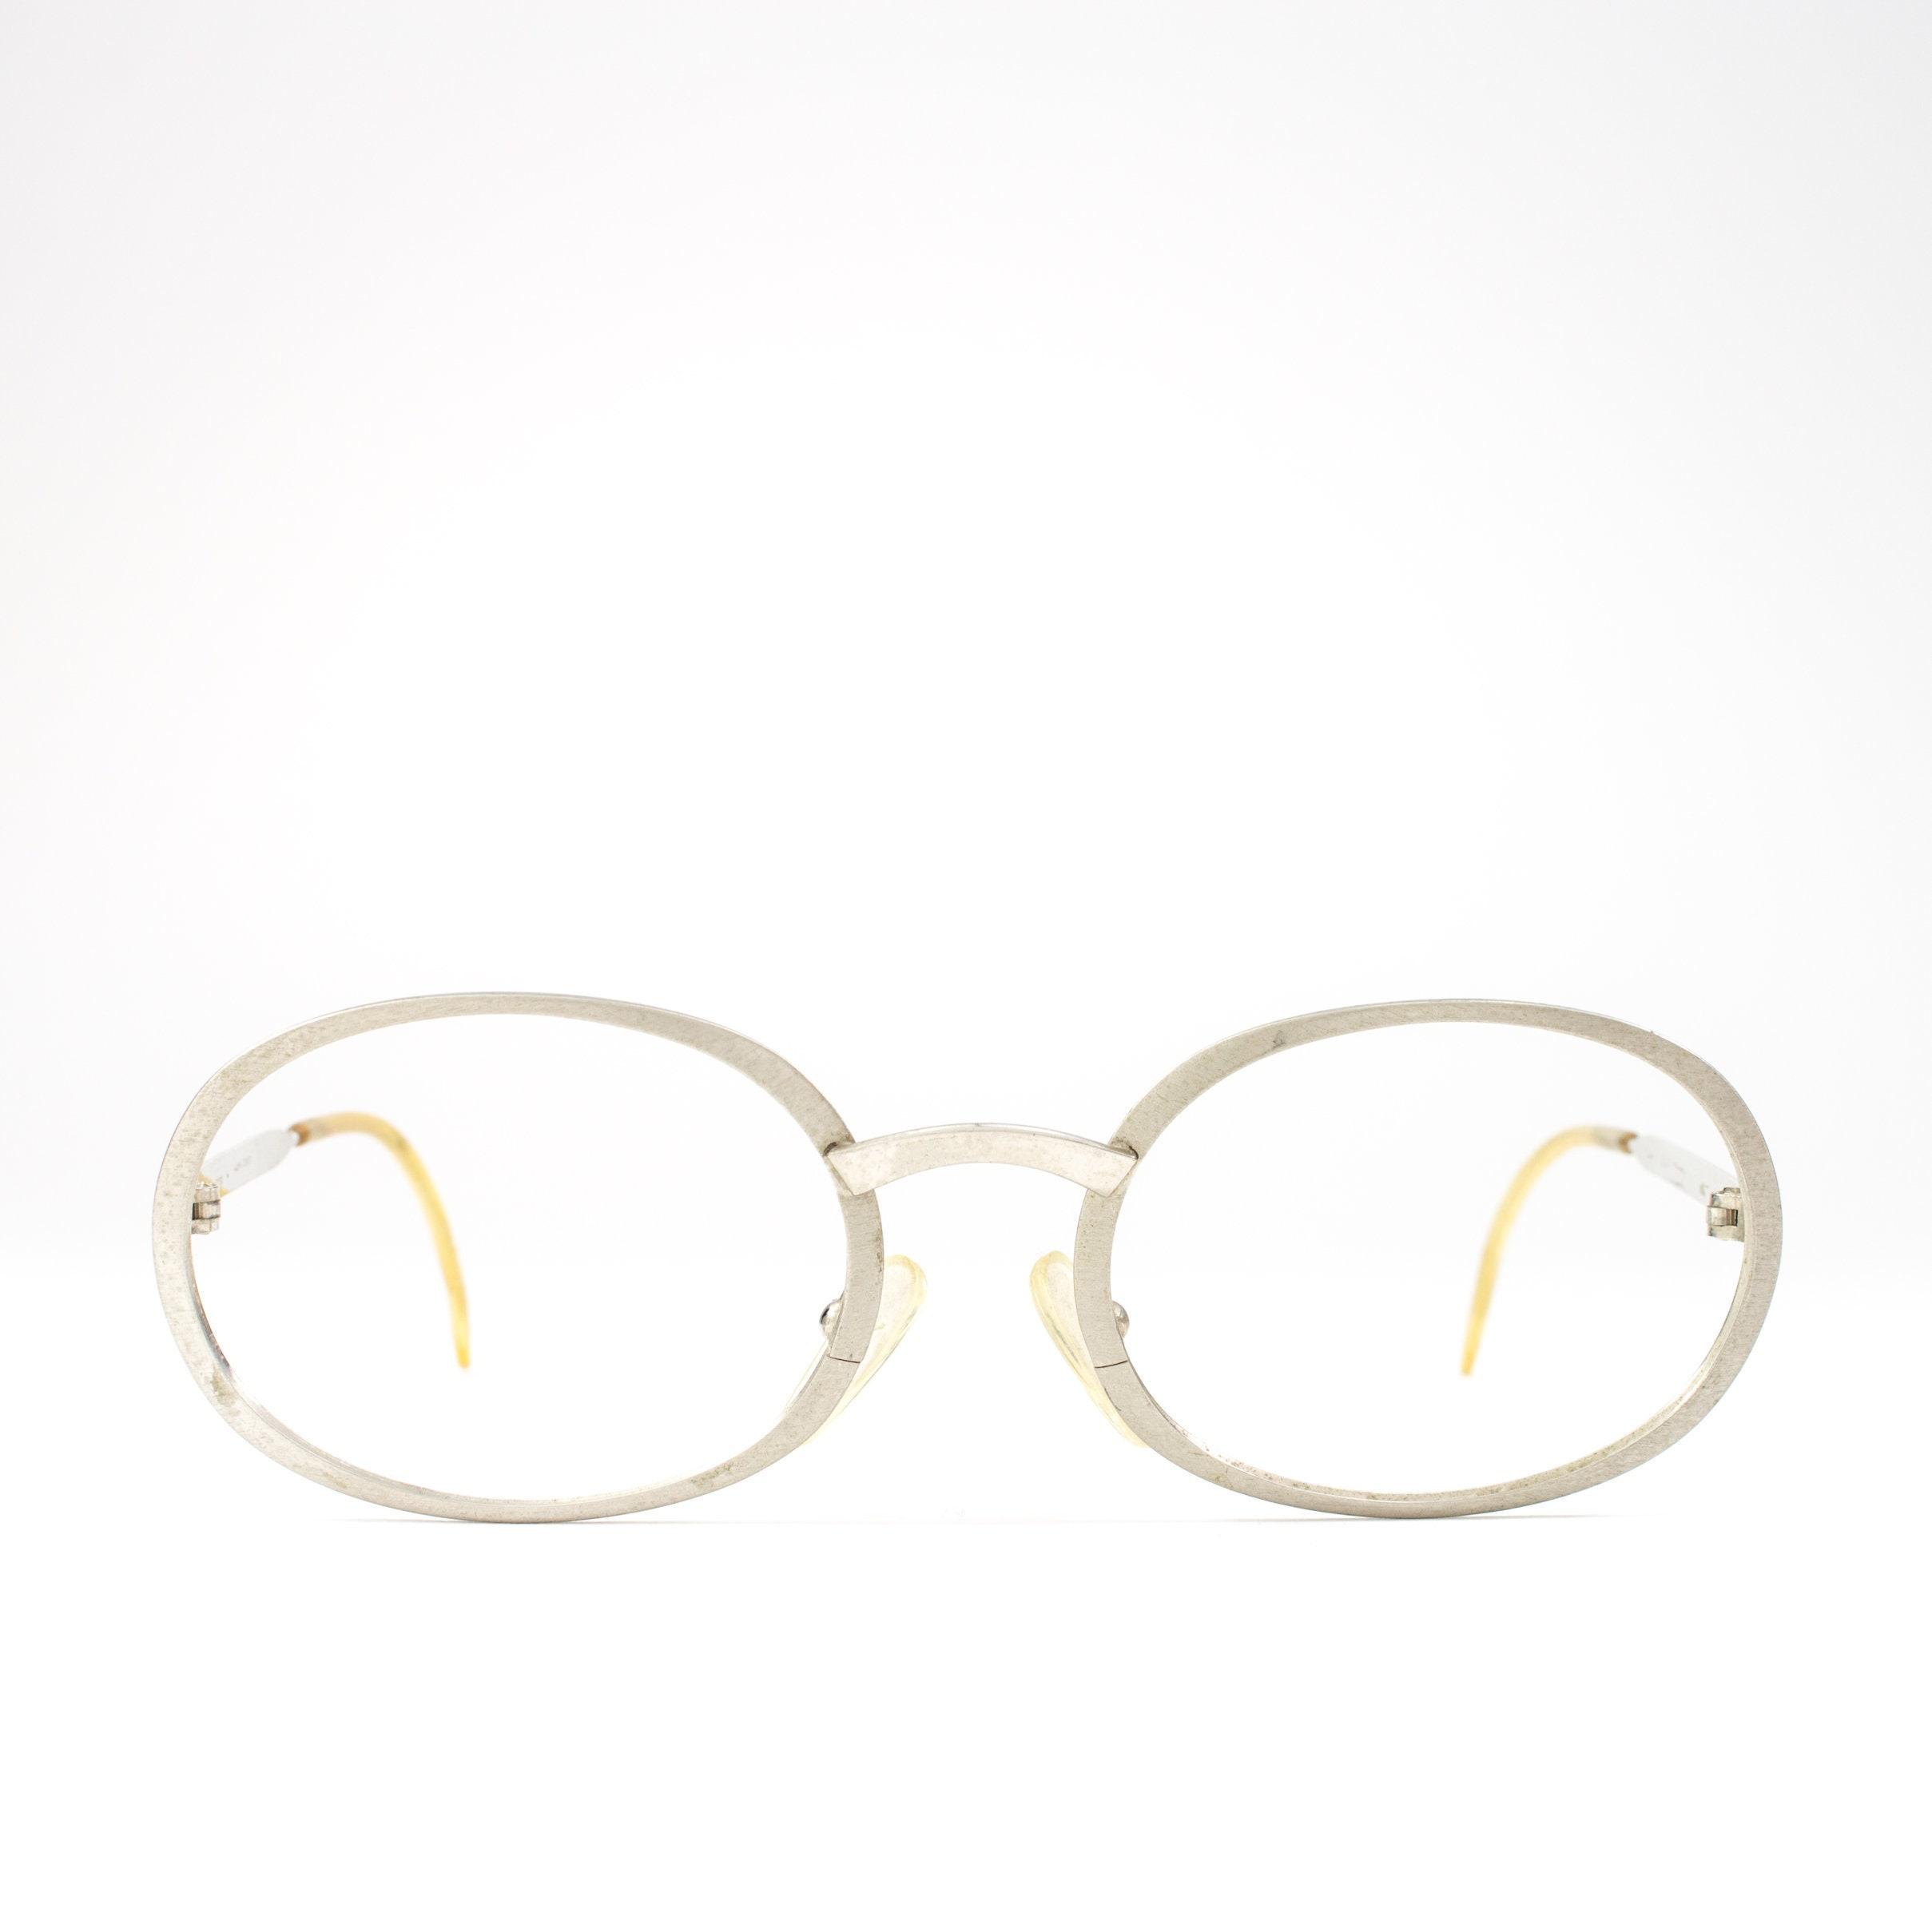 dc26ca23924 ... 1960s Round Eyeglasses